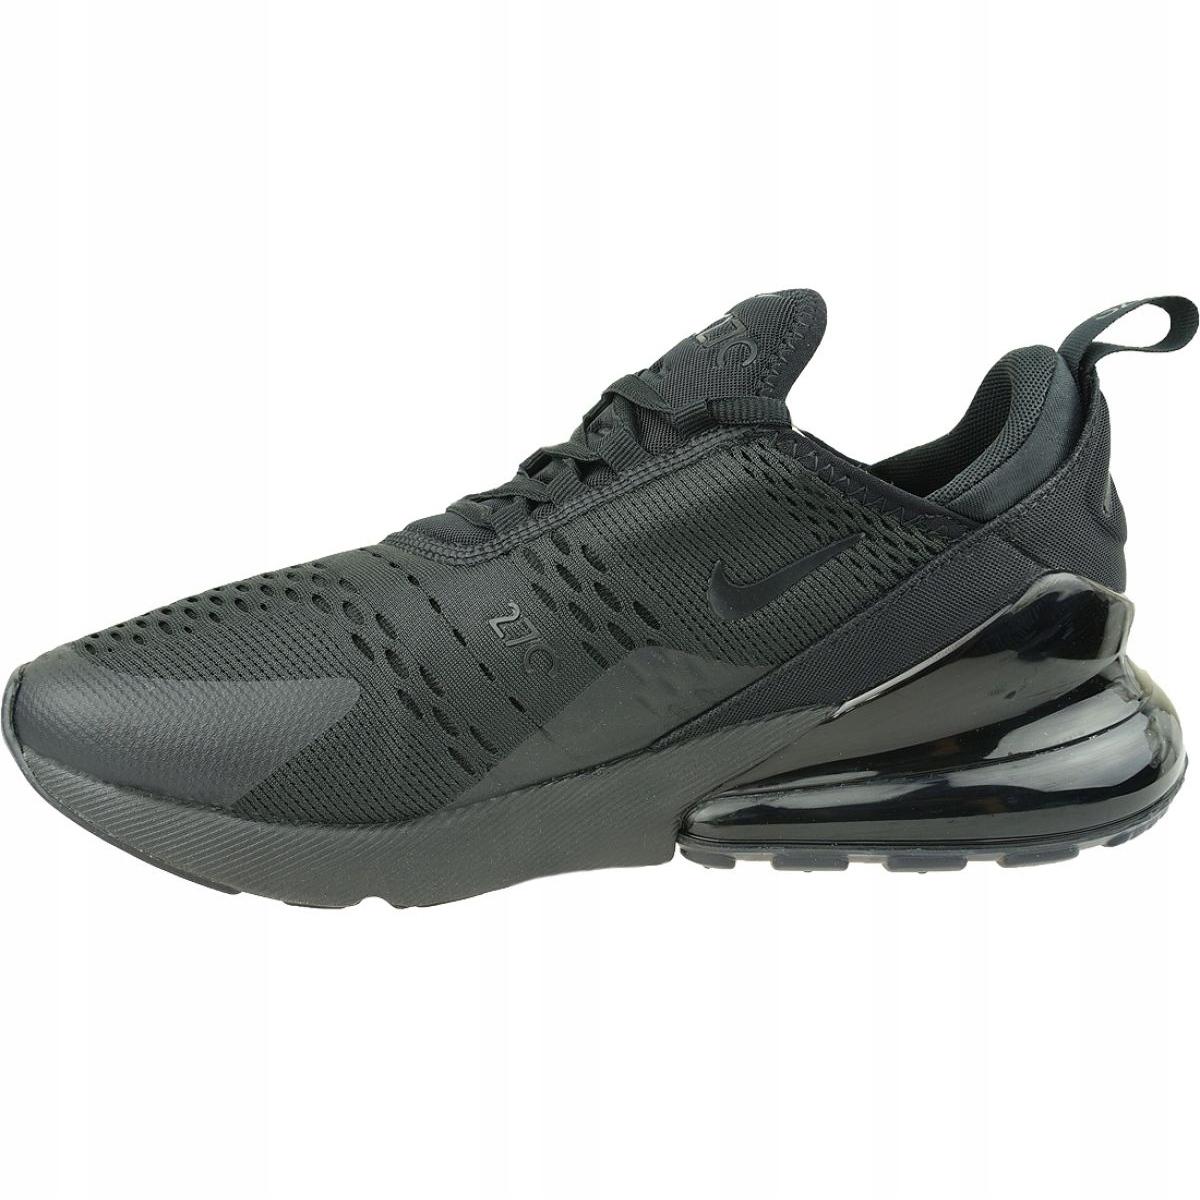 Nike Air Max 270 Futura AO1569 005